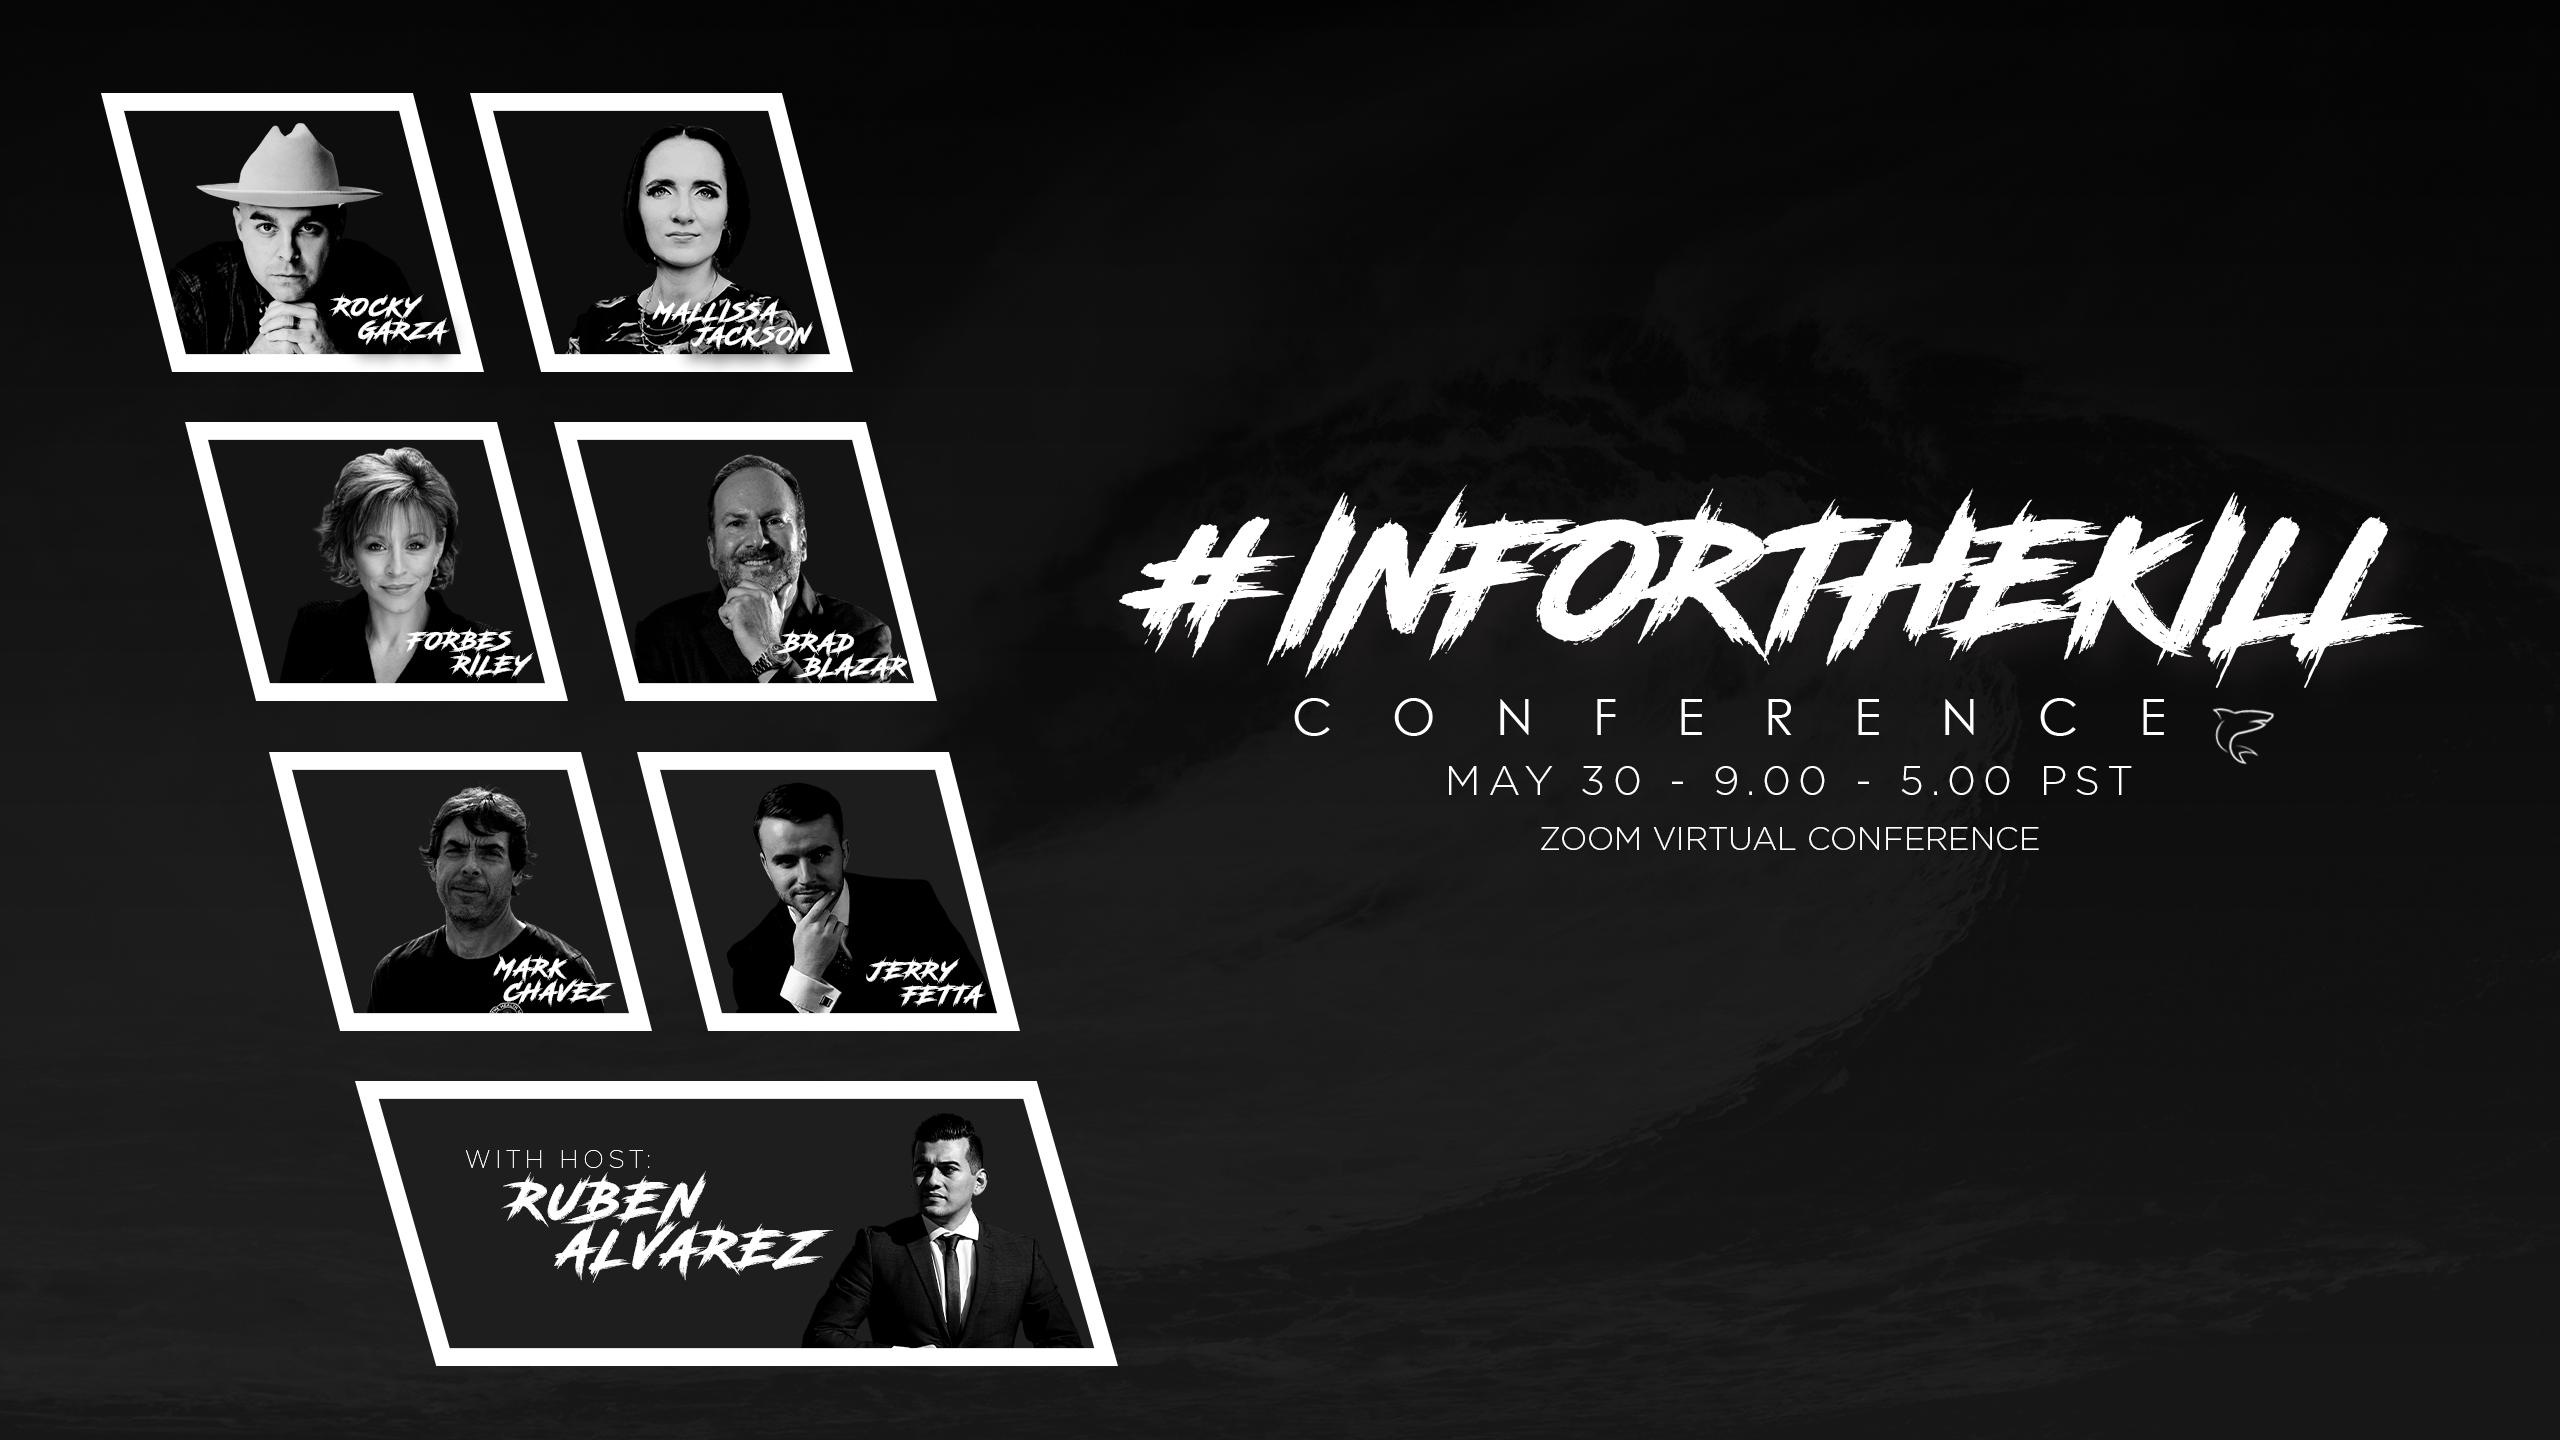 Ruben Alvarez to host the #INFORTHEKILL conference virtually